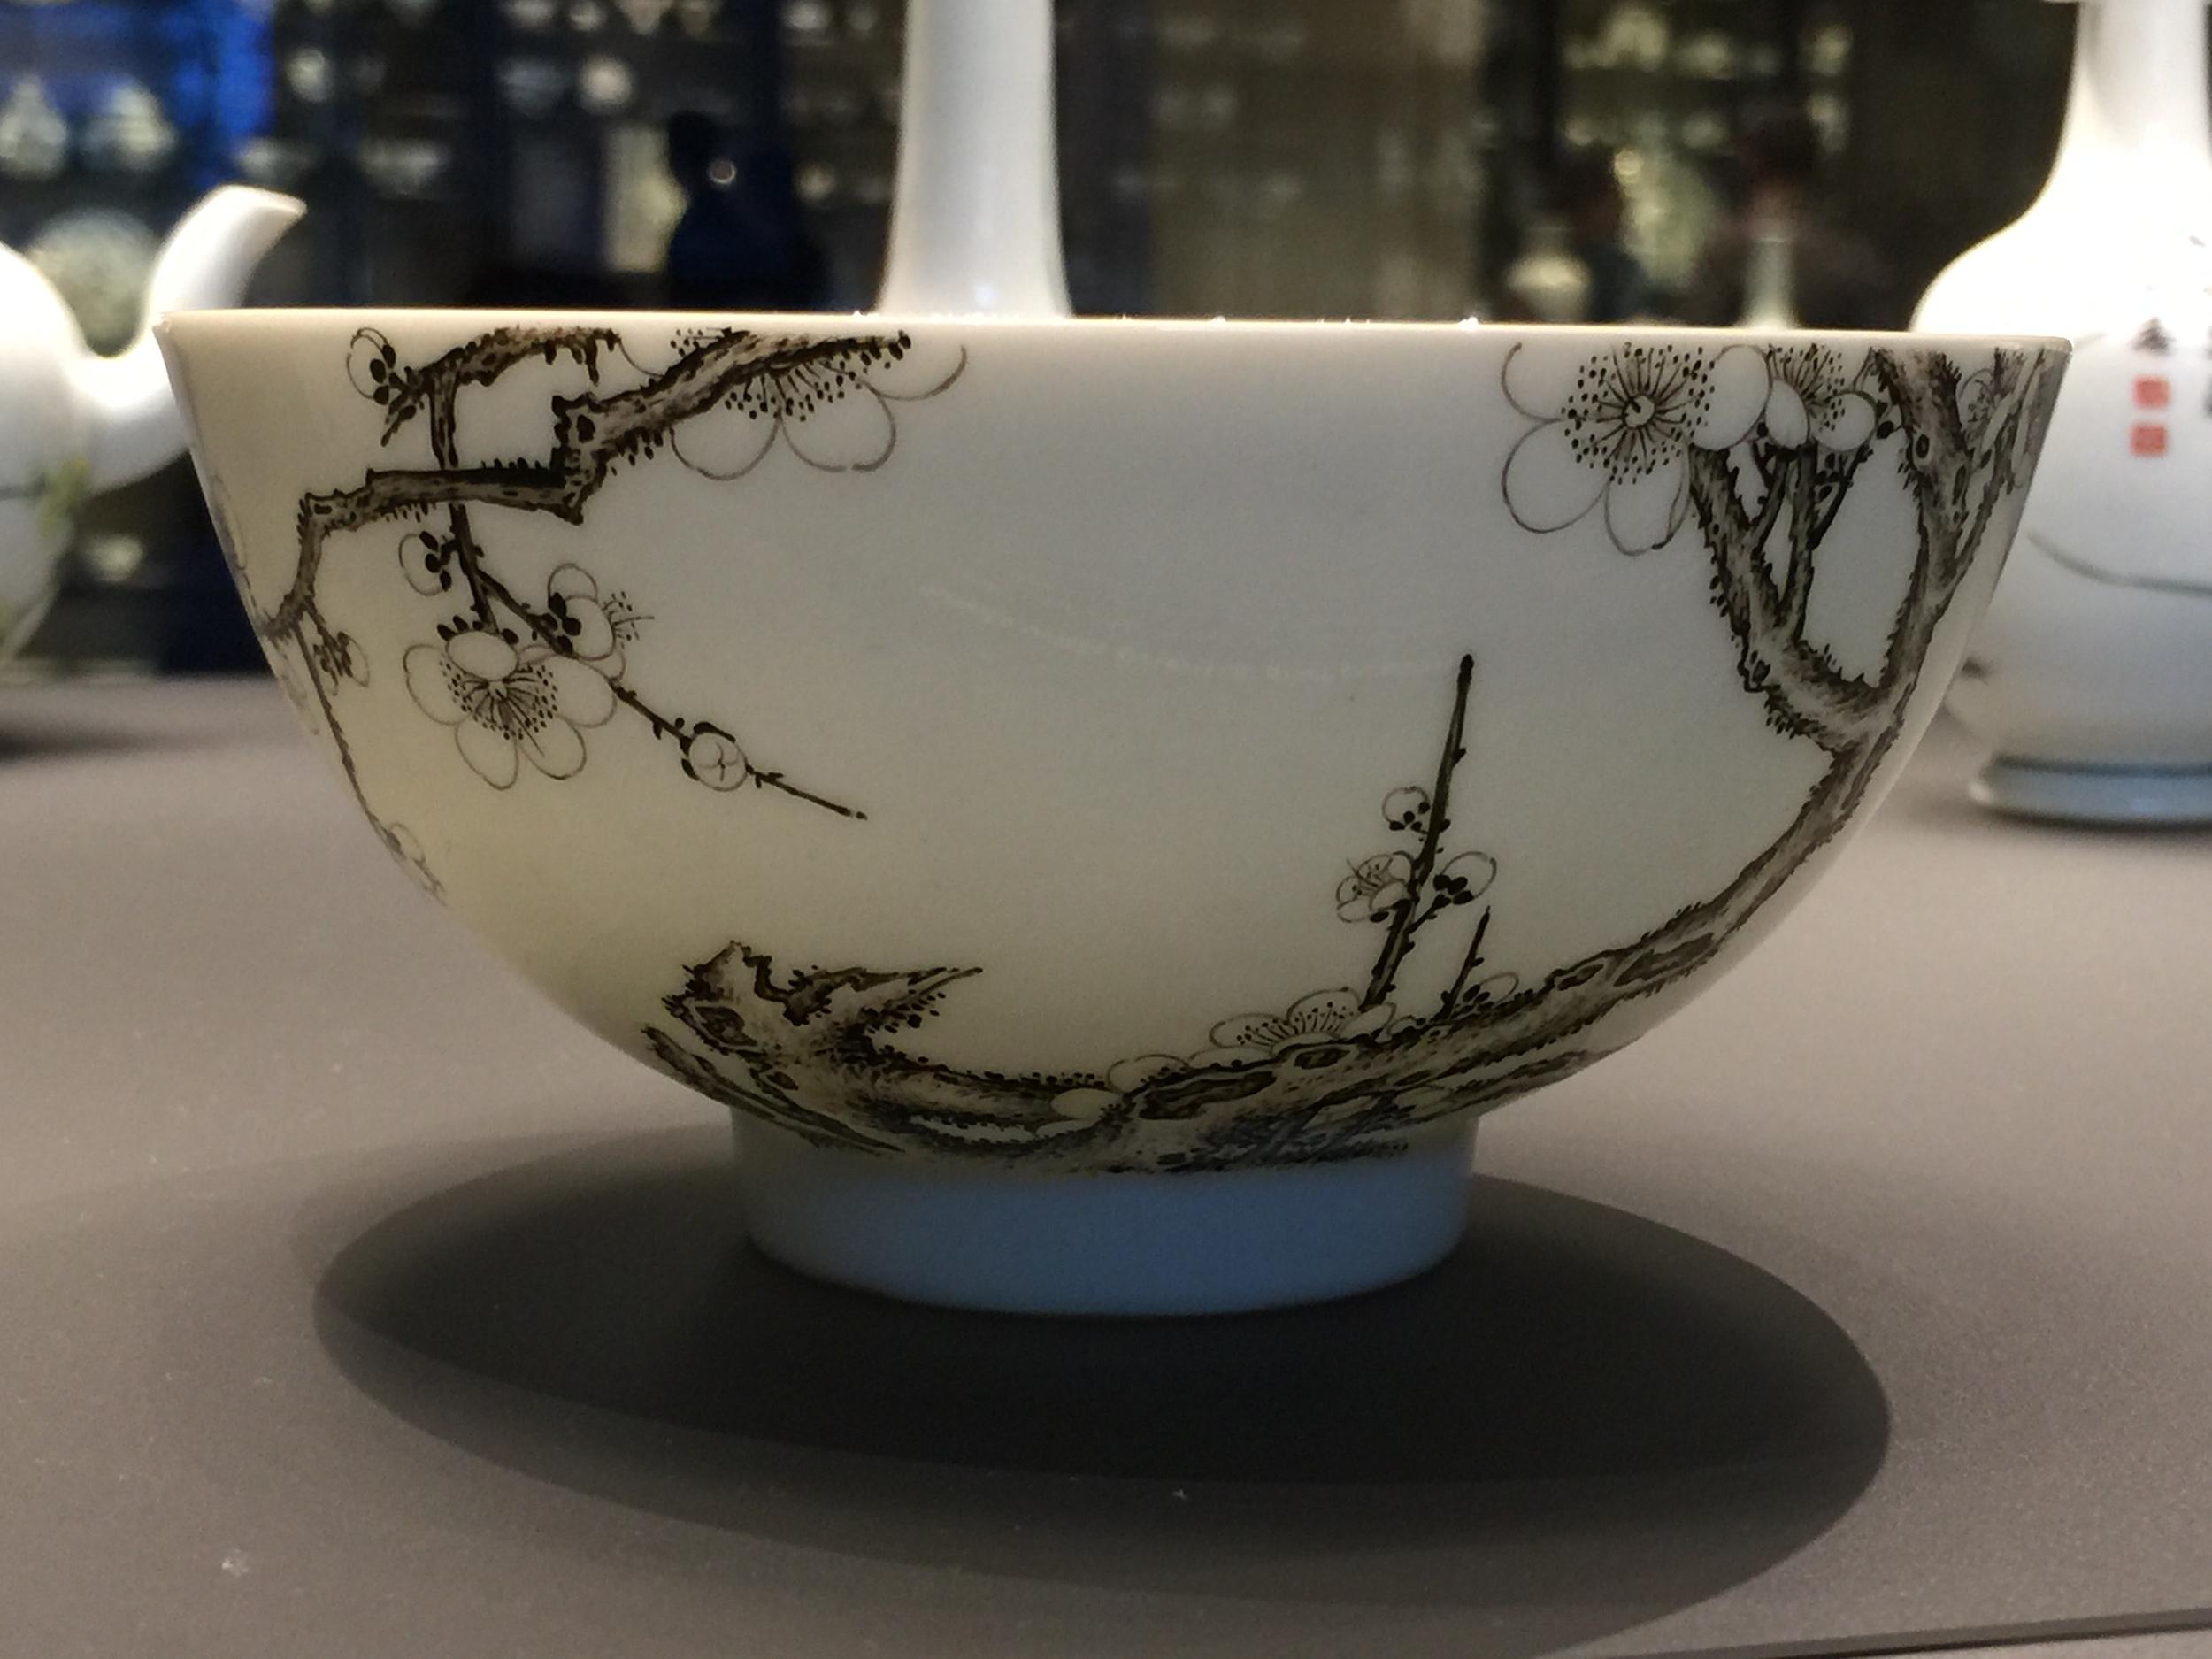 Chinese-Porcelain-British-Museum-Percival-David-jessewaugh.com-89.jpg